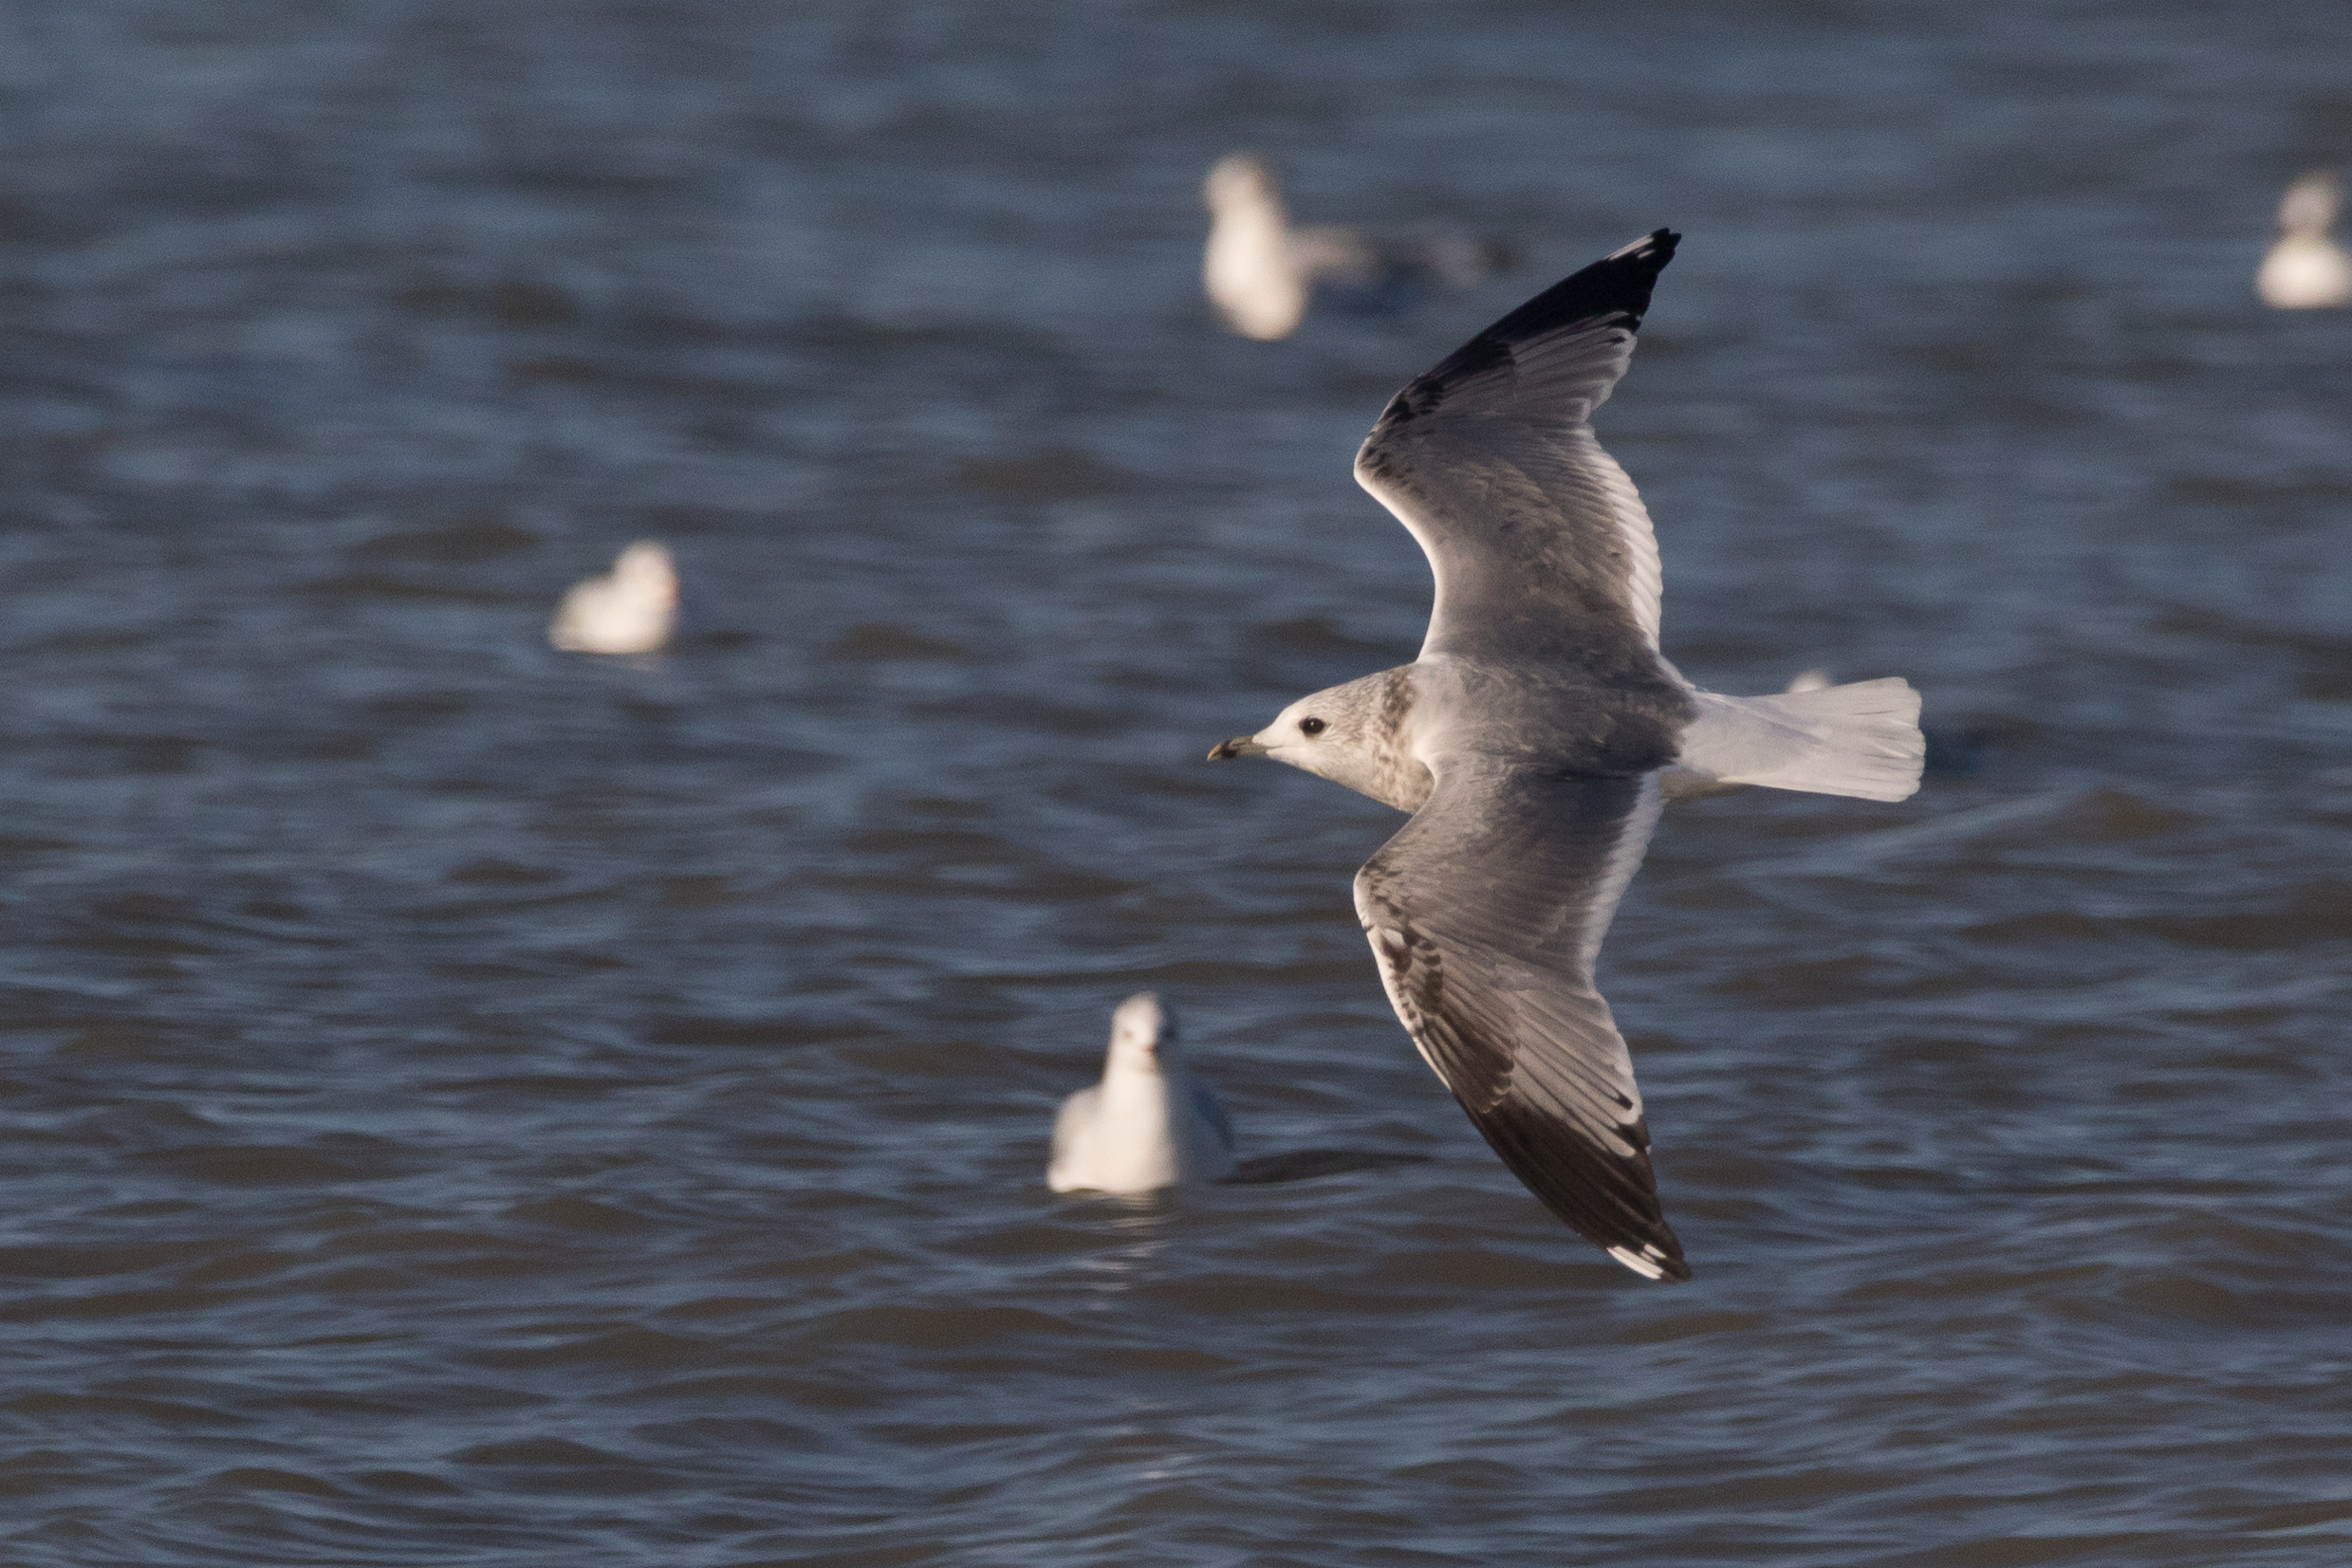 20170121-Common Gull 3CY-01.jpg